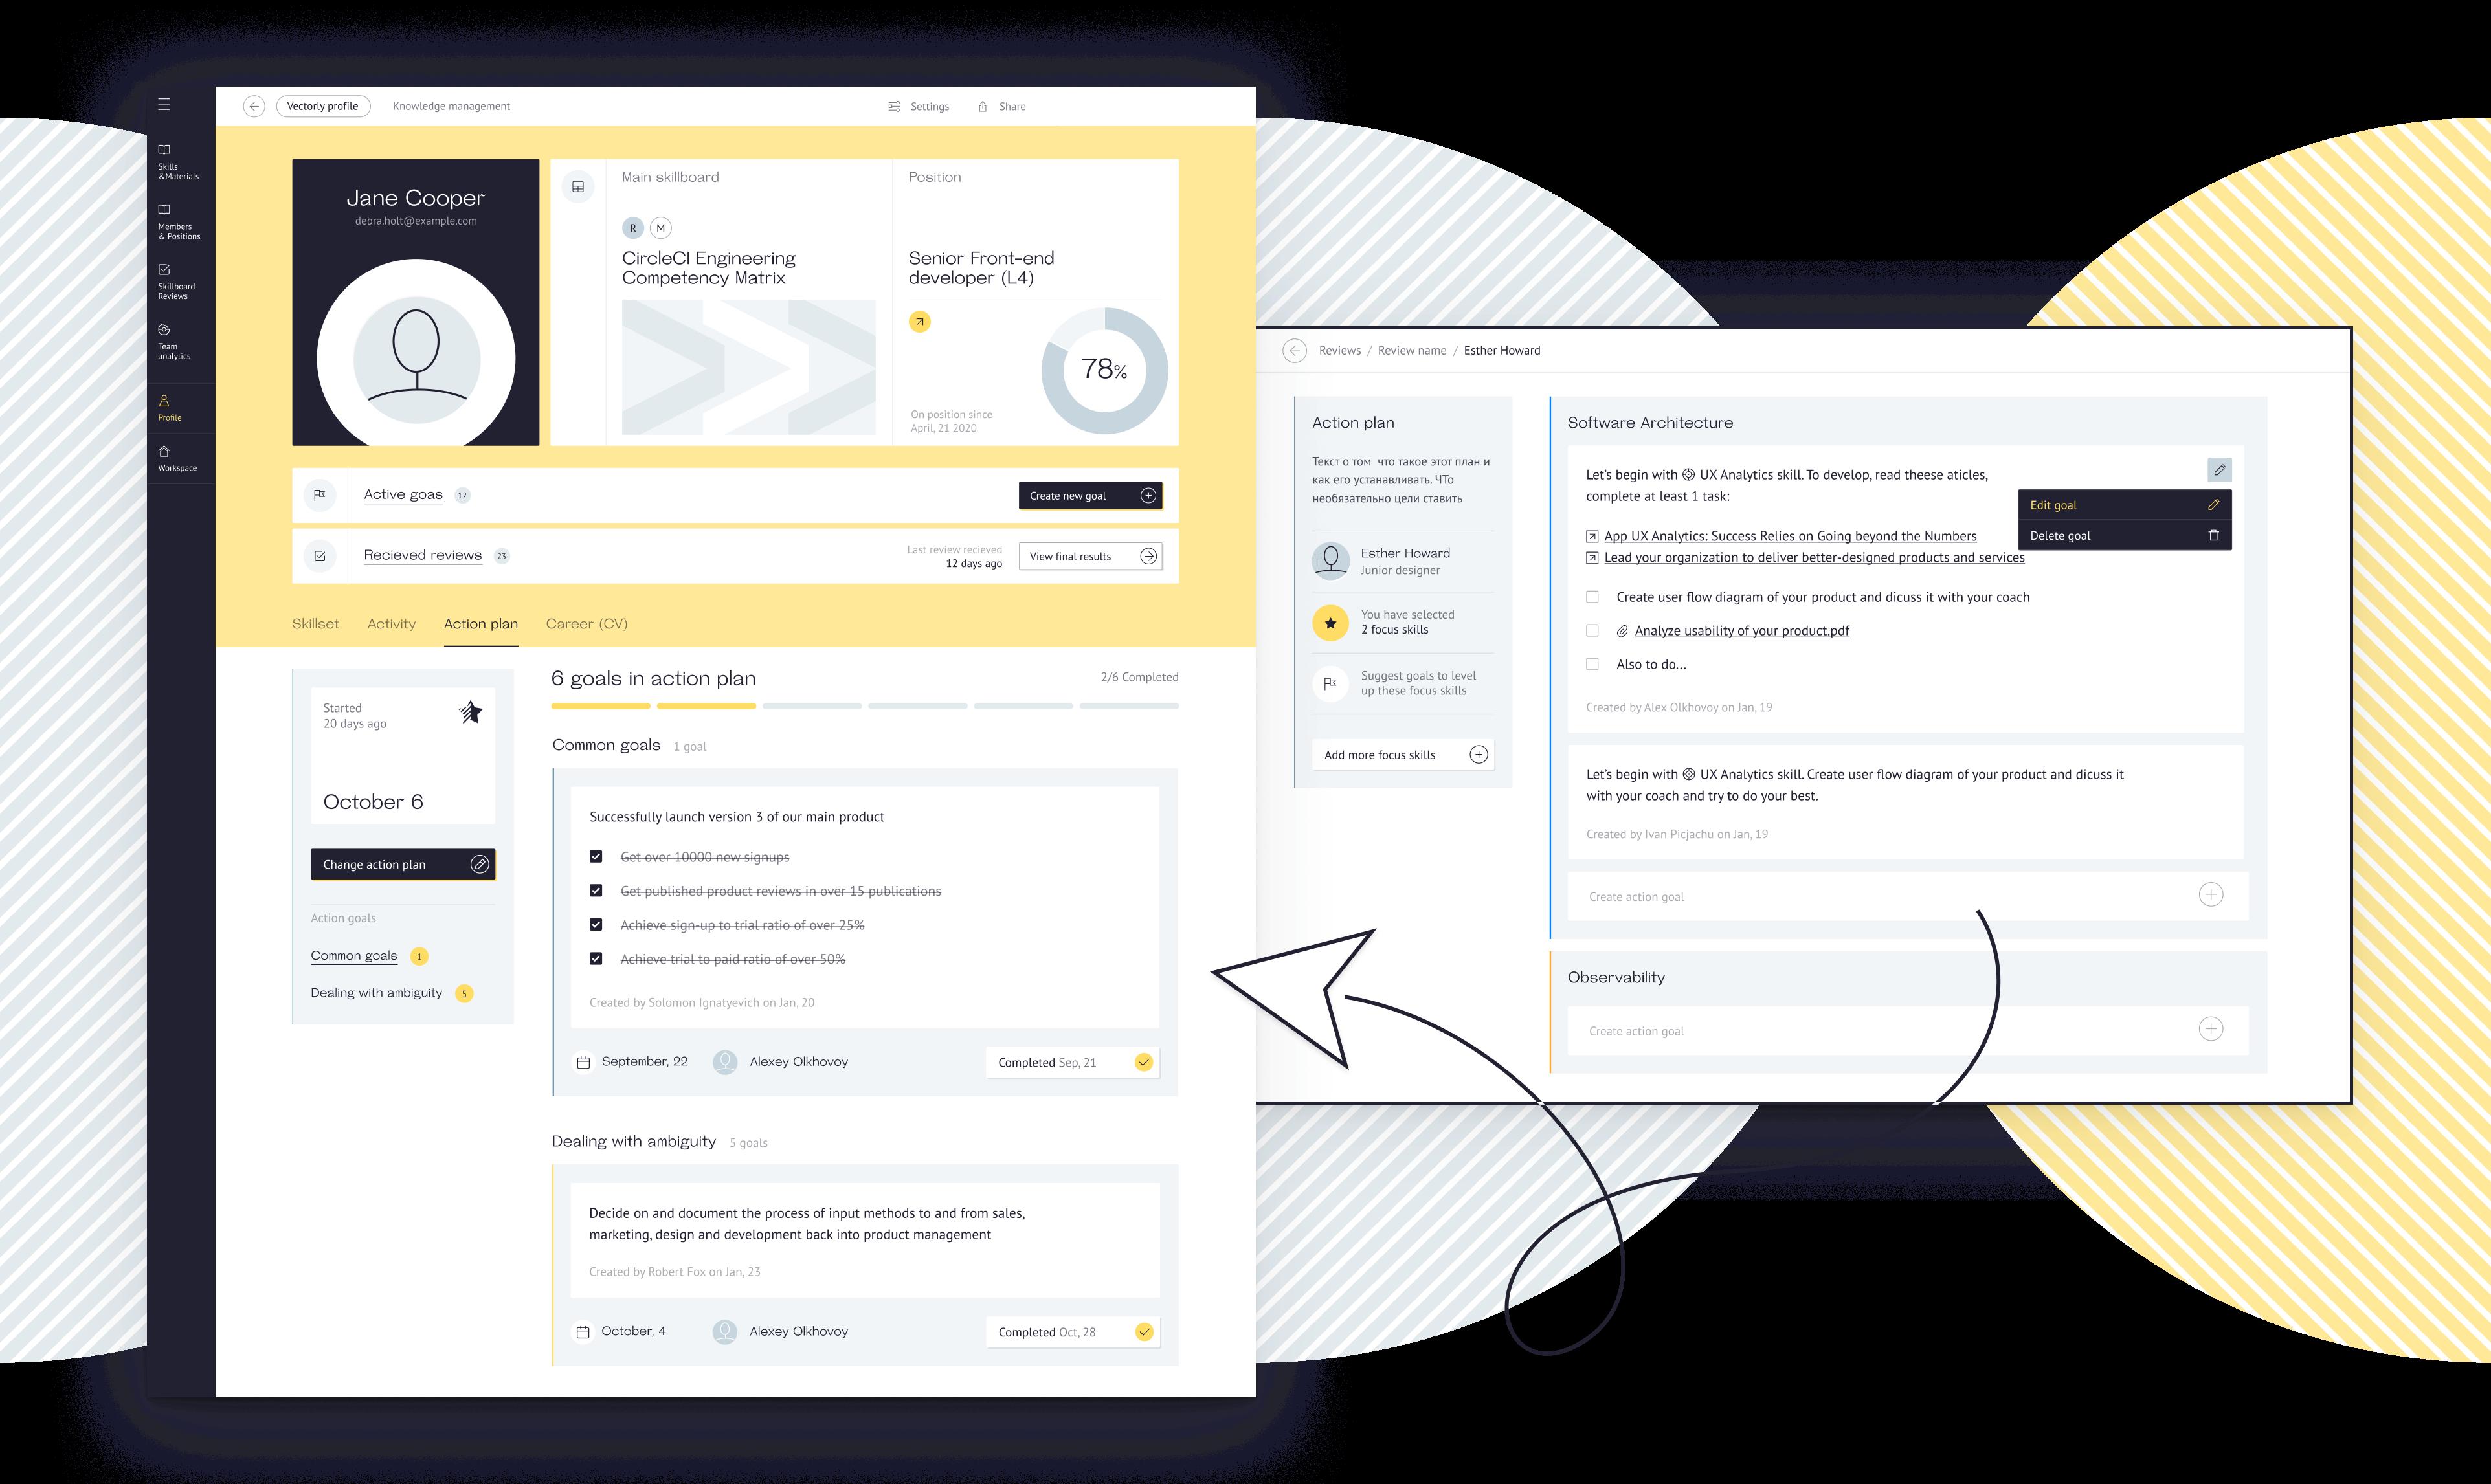 Interface Image